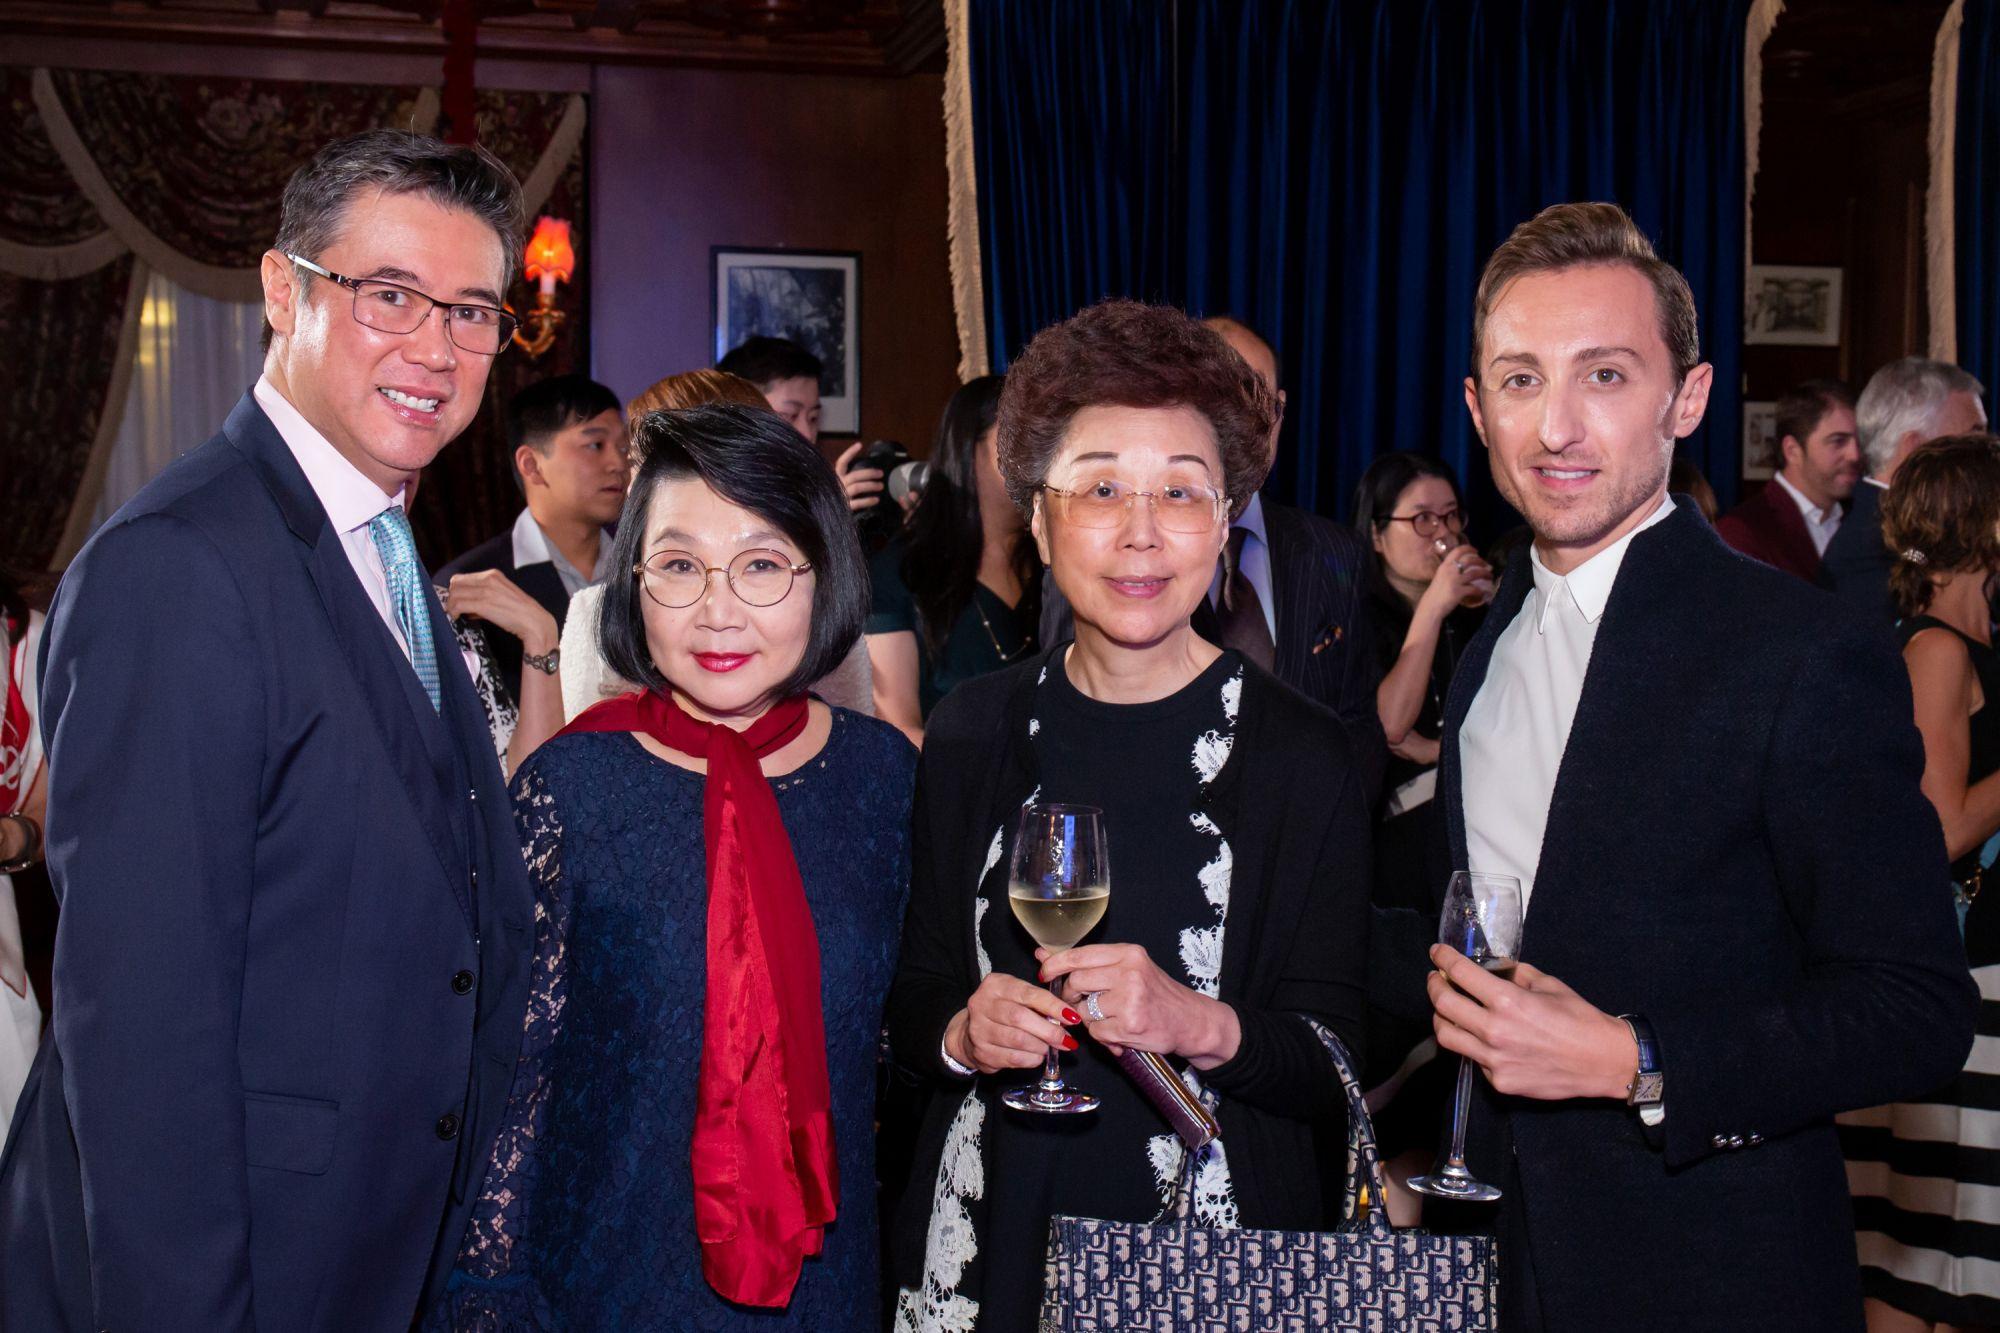 Andrew Yuen, Janice Choi, Mignonne Cheng, Julien-Loïc Garin